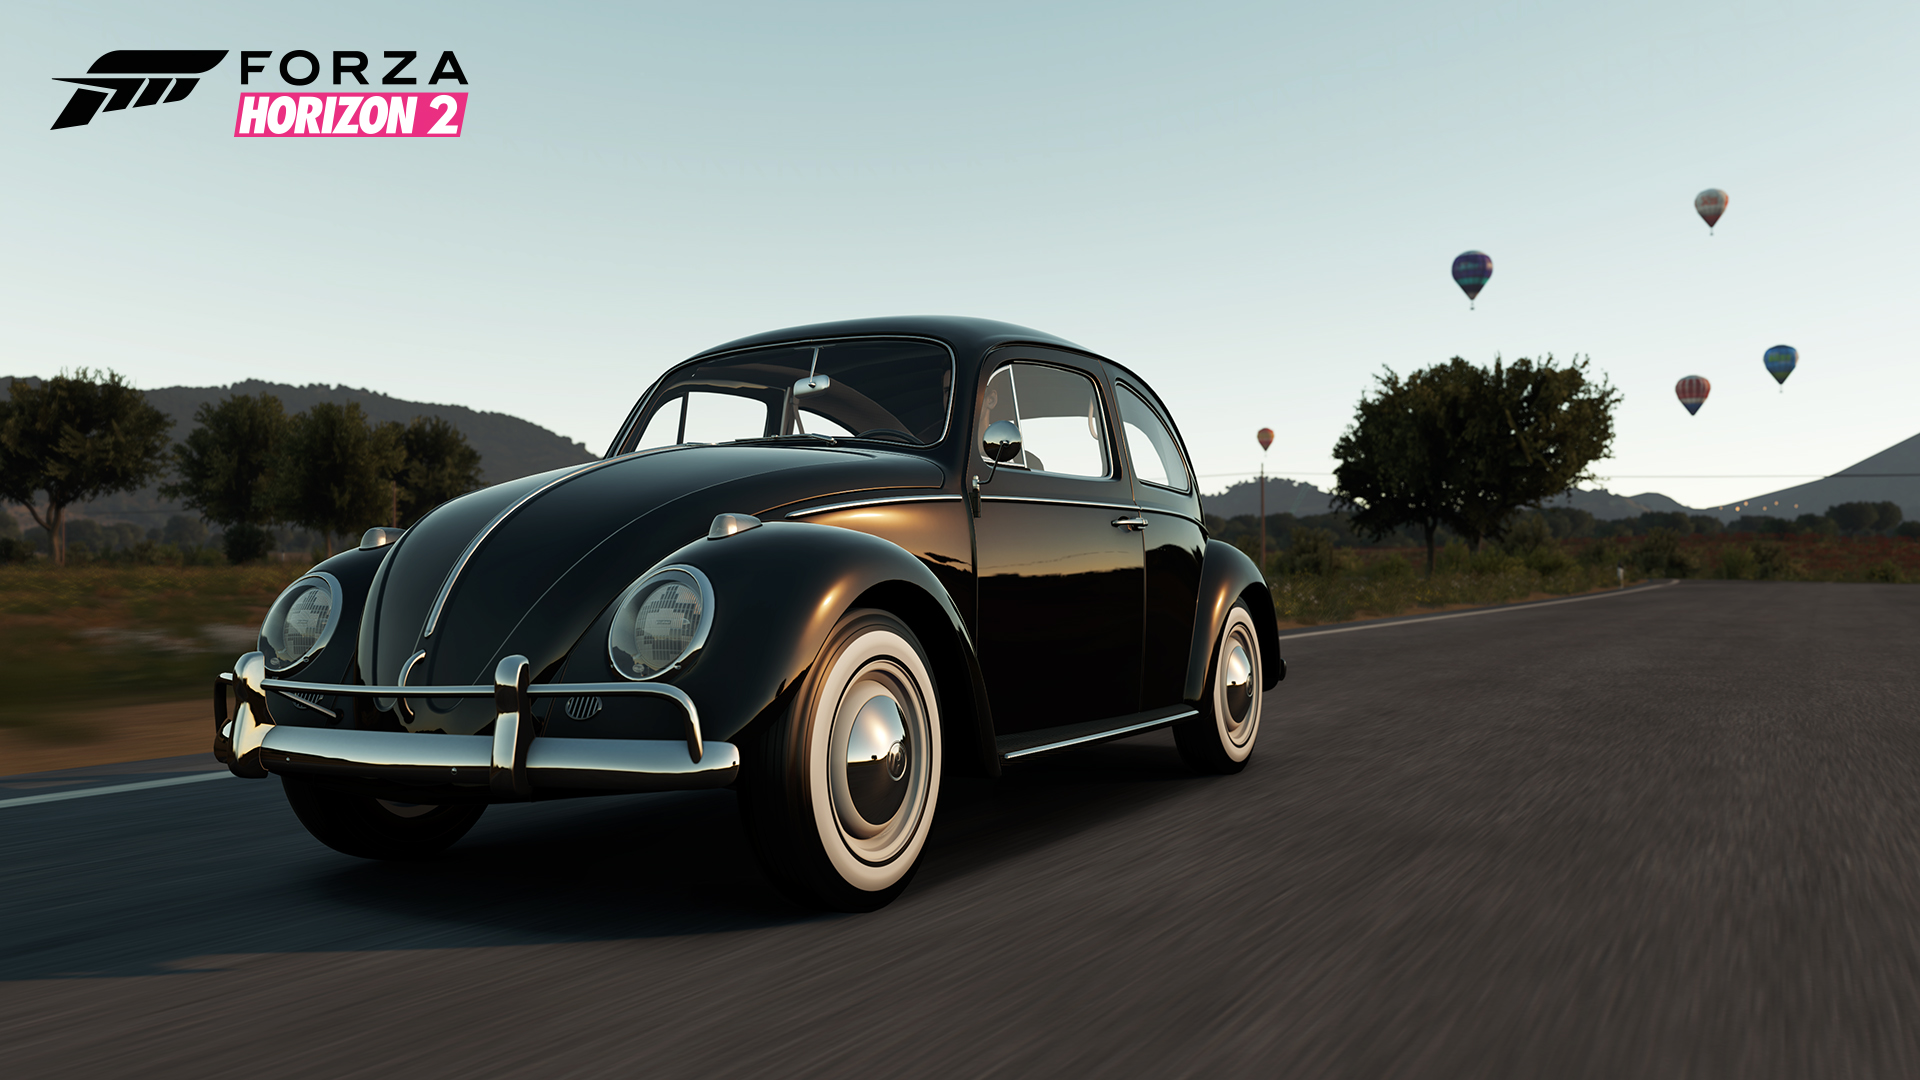 Forza Horizon 2 Xbox One demo, more cars, achievements, announced - VG247